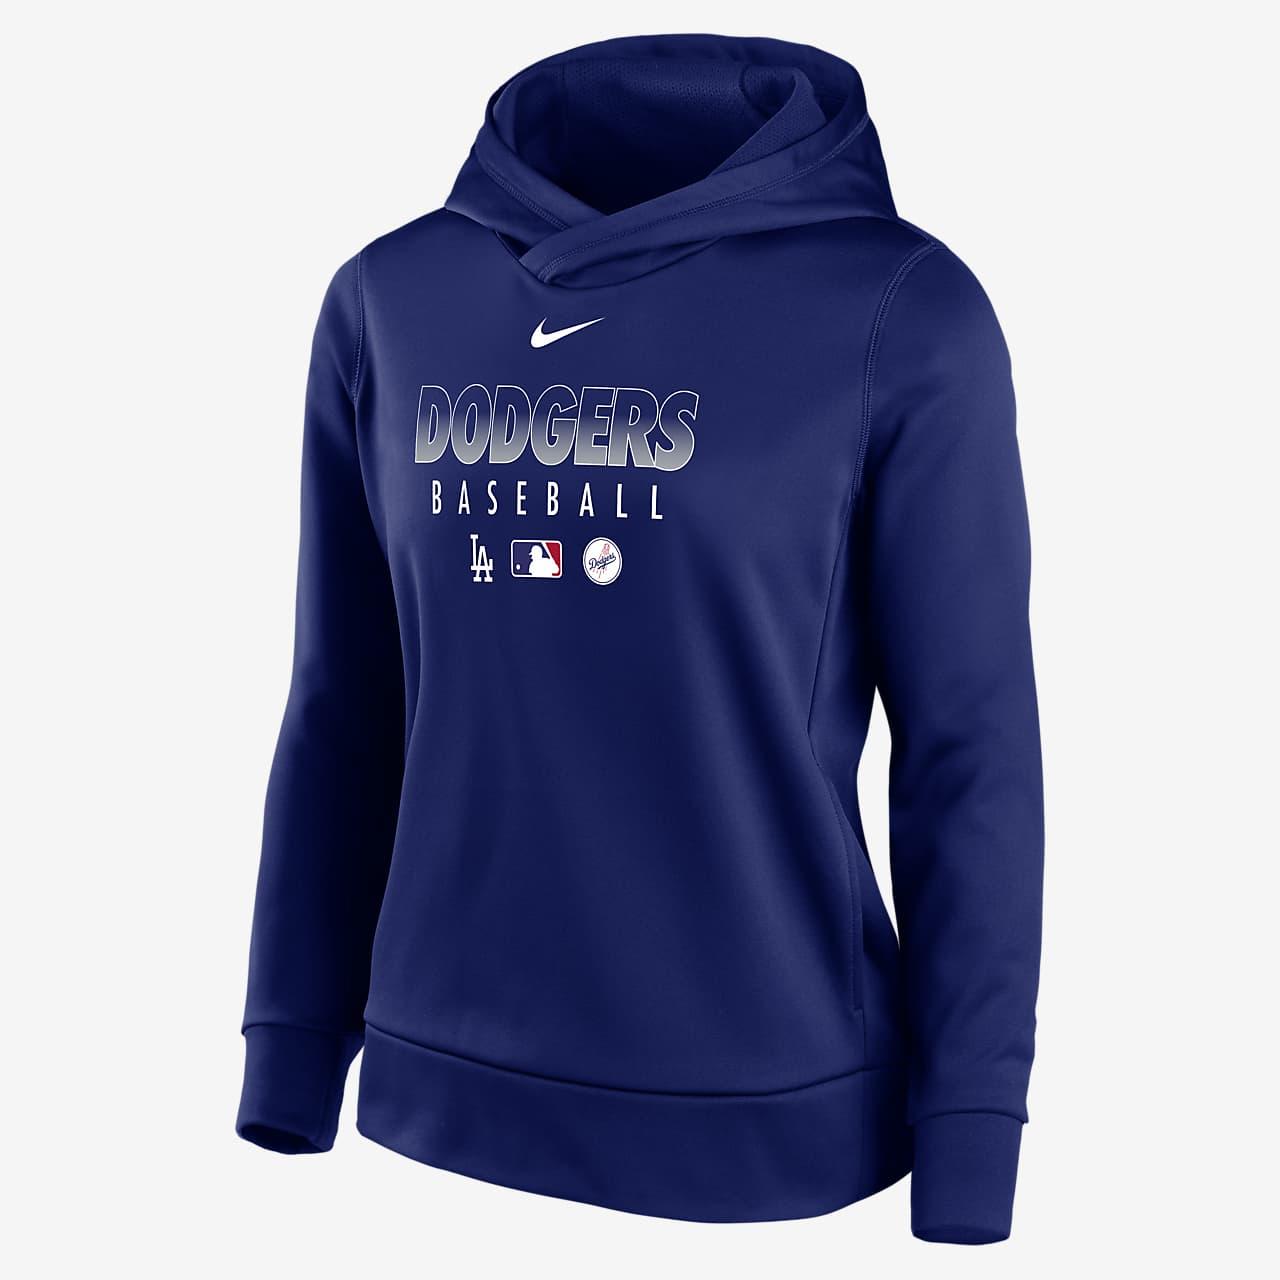 Nike Therma (MLB Los Angeles Dodgers) Women's Pullover Hoodie